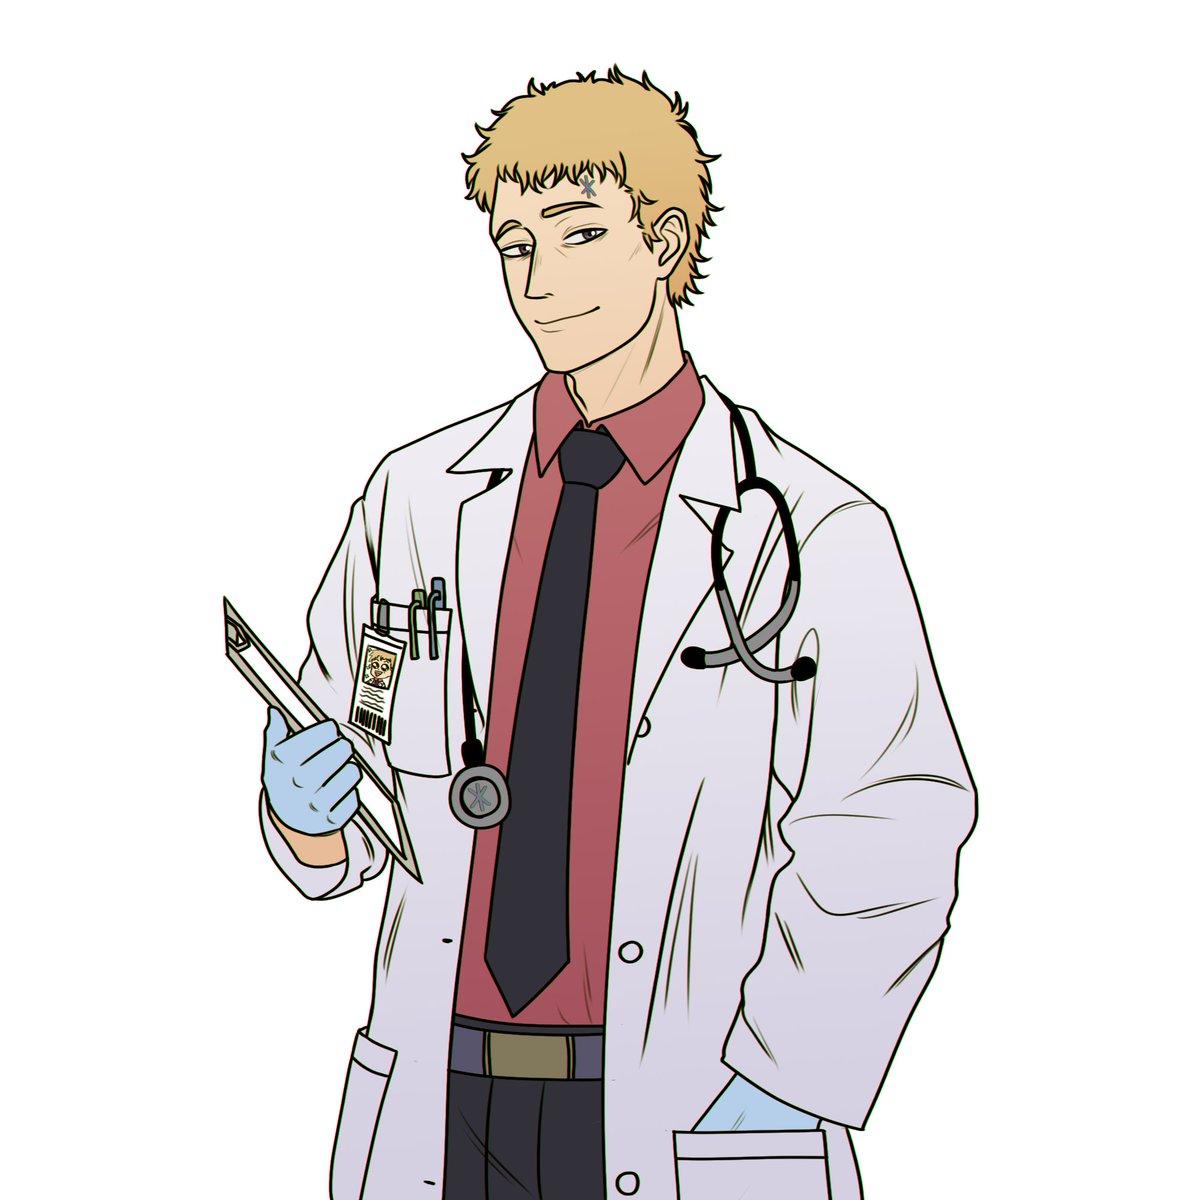 Juliusnovachrono Hashtag On Twitter Konsep karakter otaku manga nova tanduk rusa lucu permainan video. juliusnovachrono hashtag on twitter